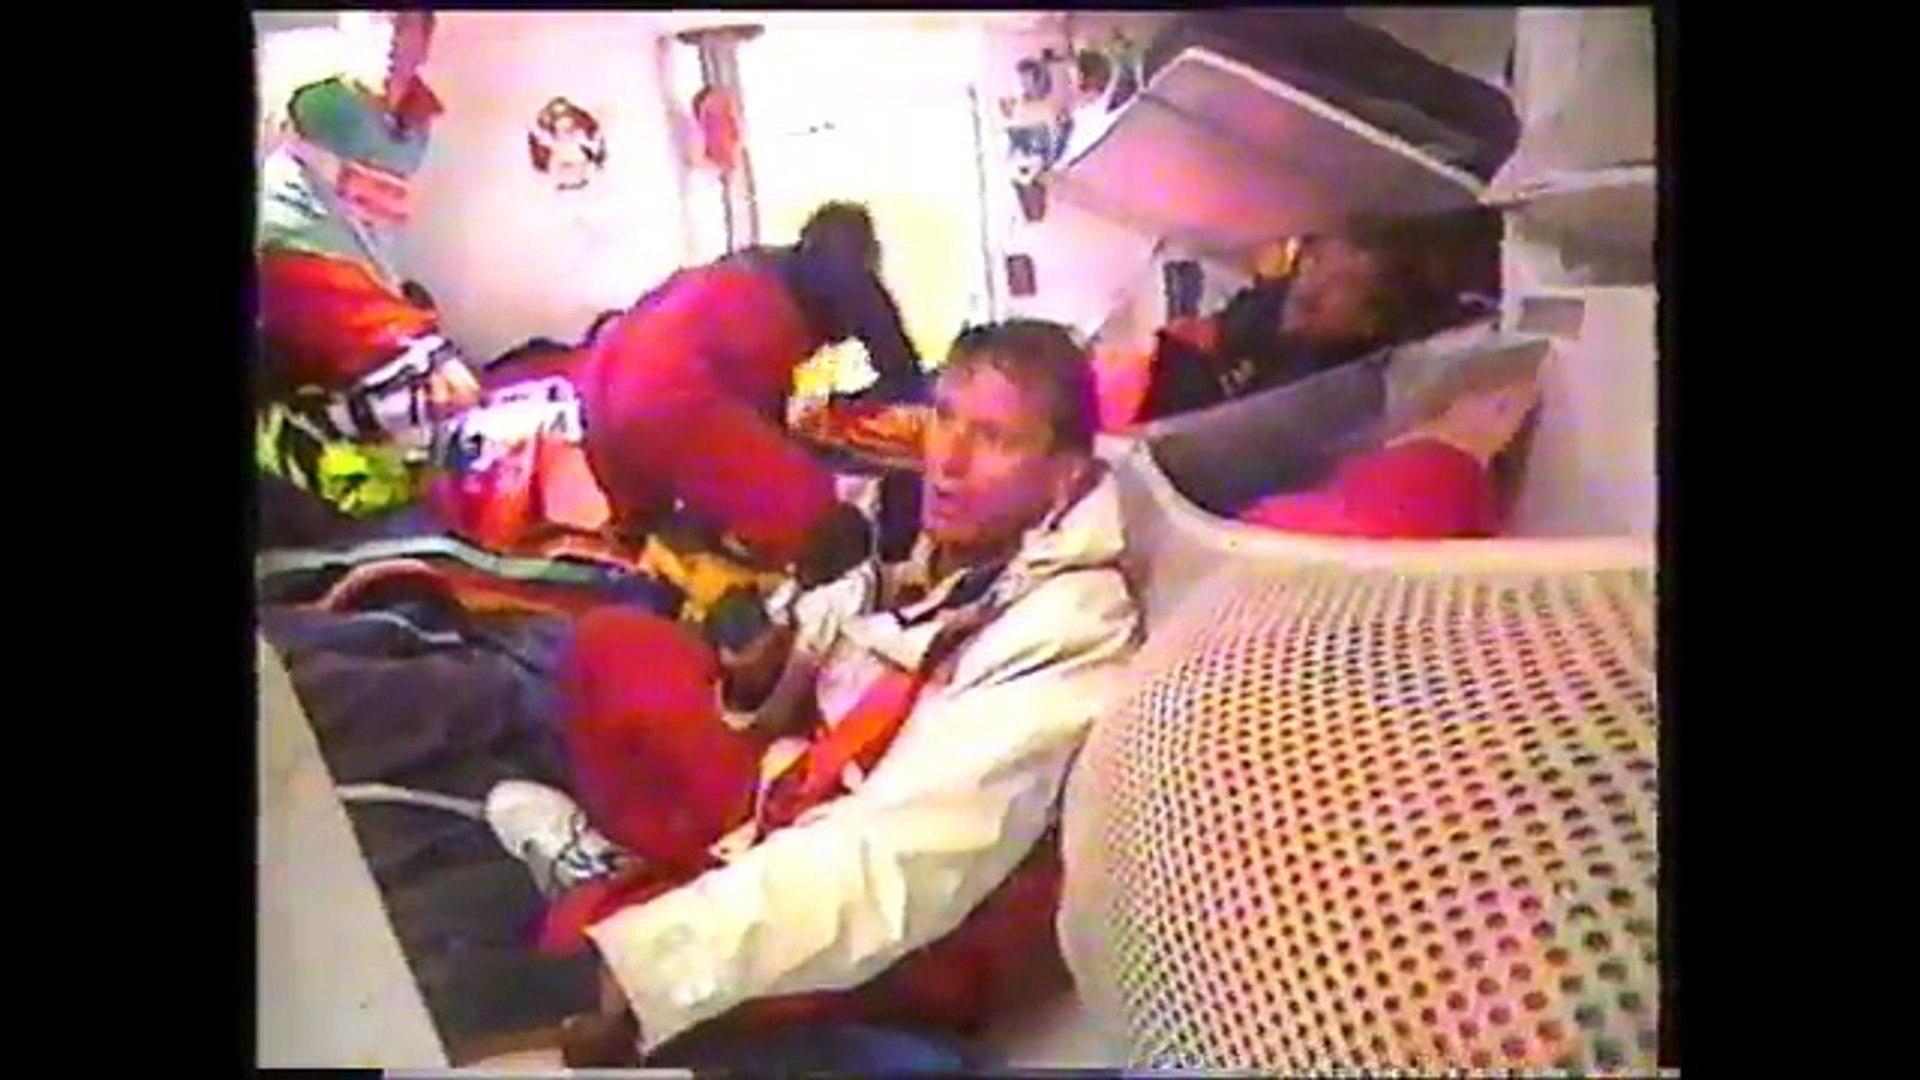 Channel Ten - 1992 Sydney to Hobart Yacht Race Update (29 December 1992)